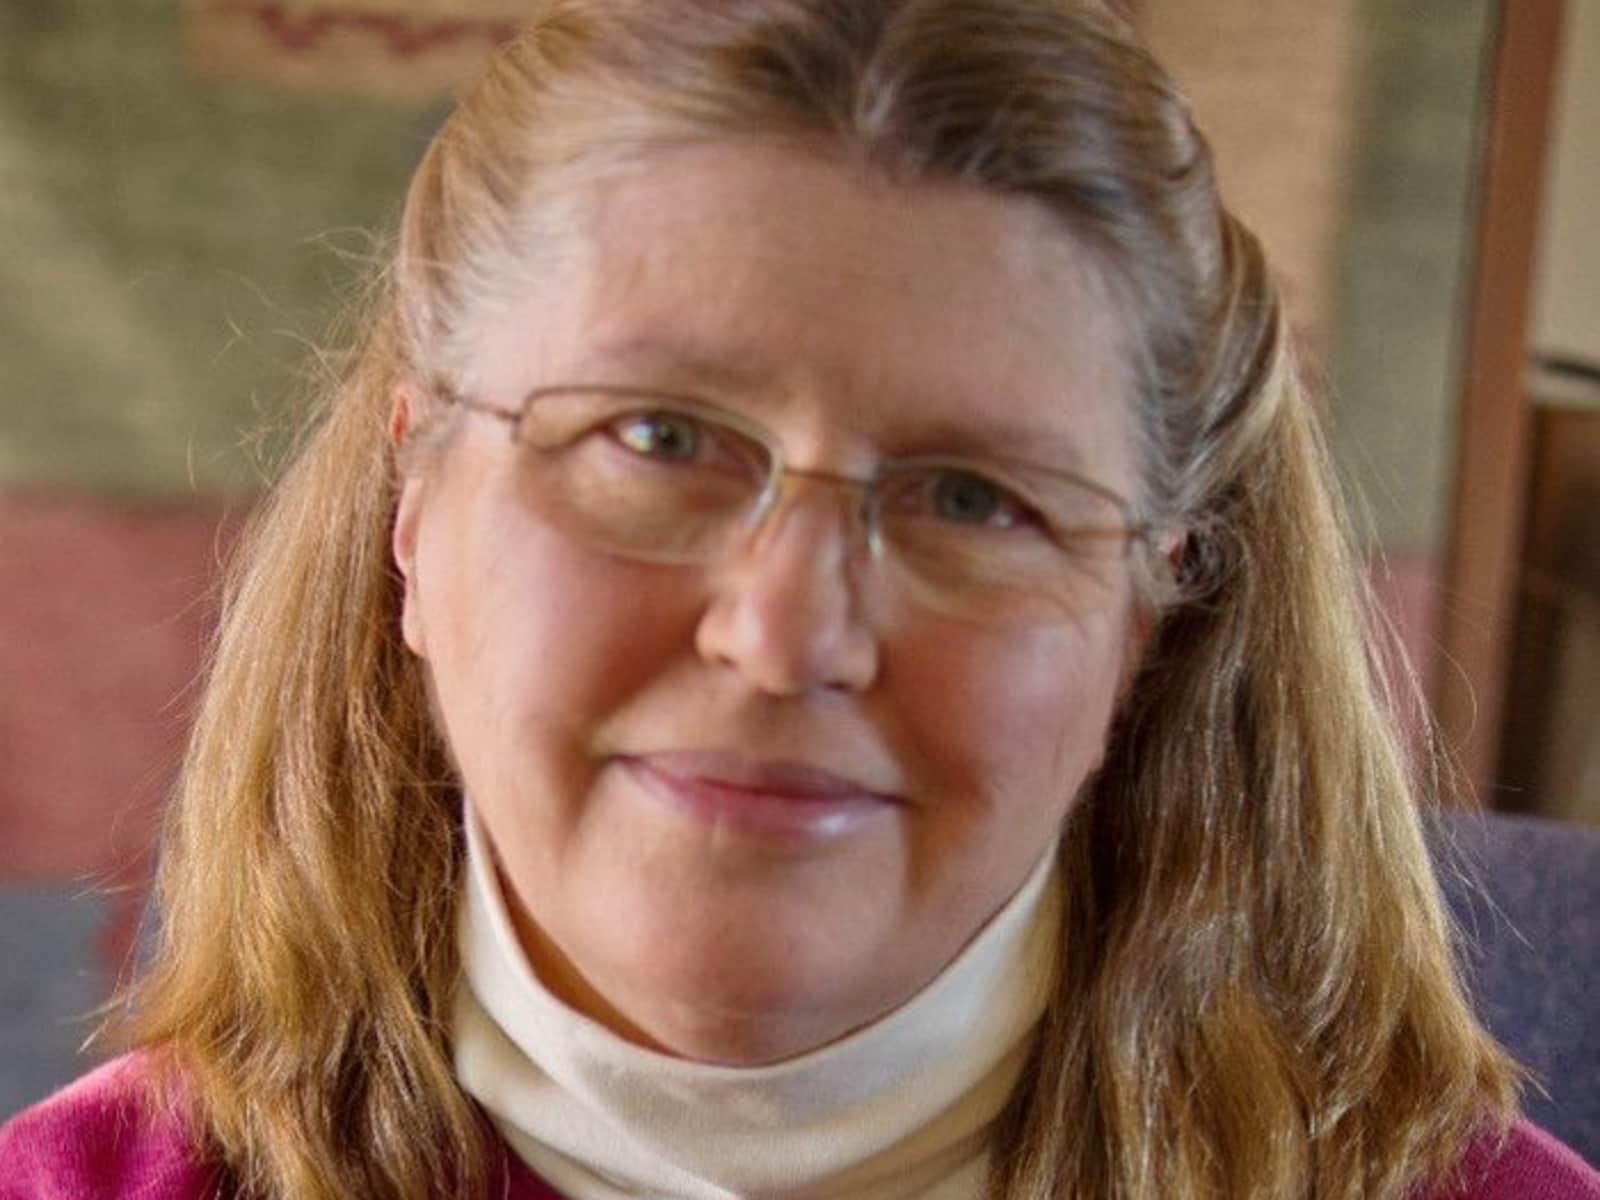 Mary from Friday Harbor, Washington, United States